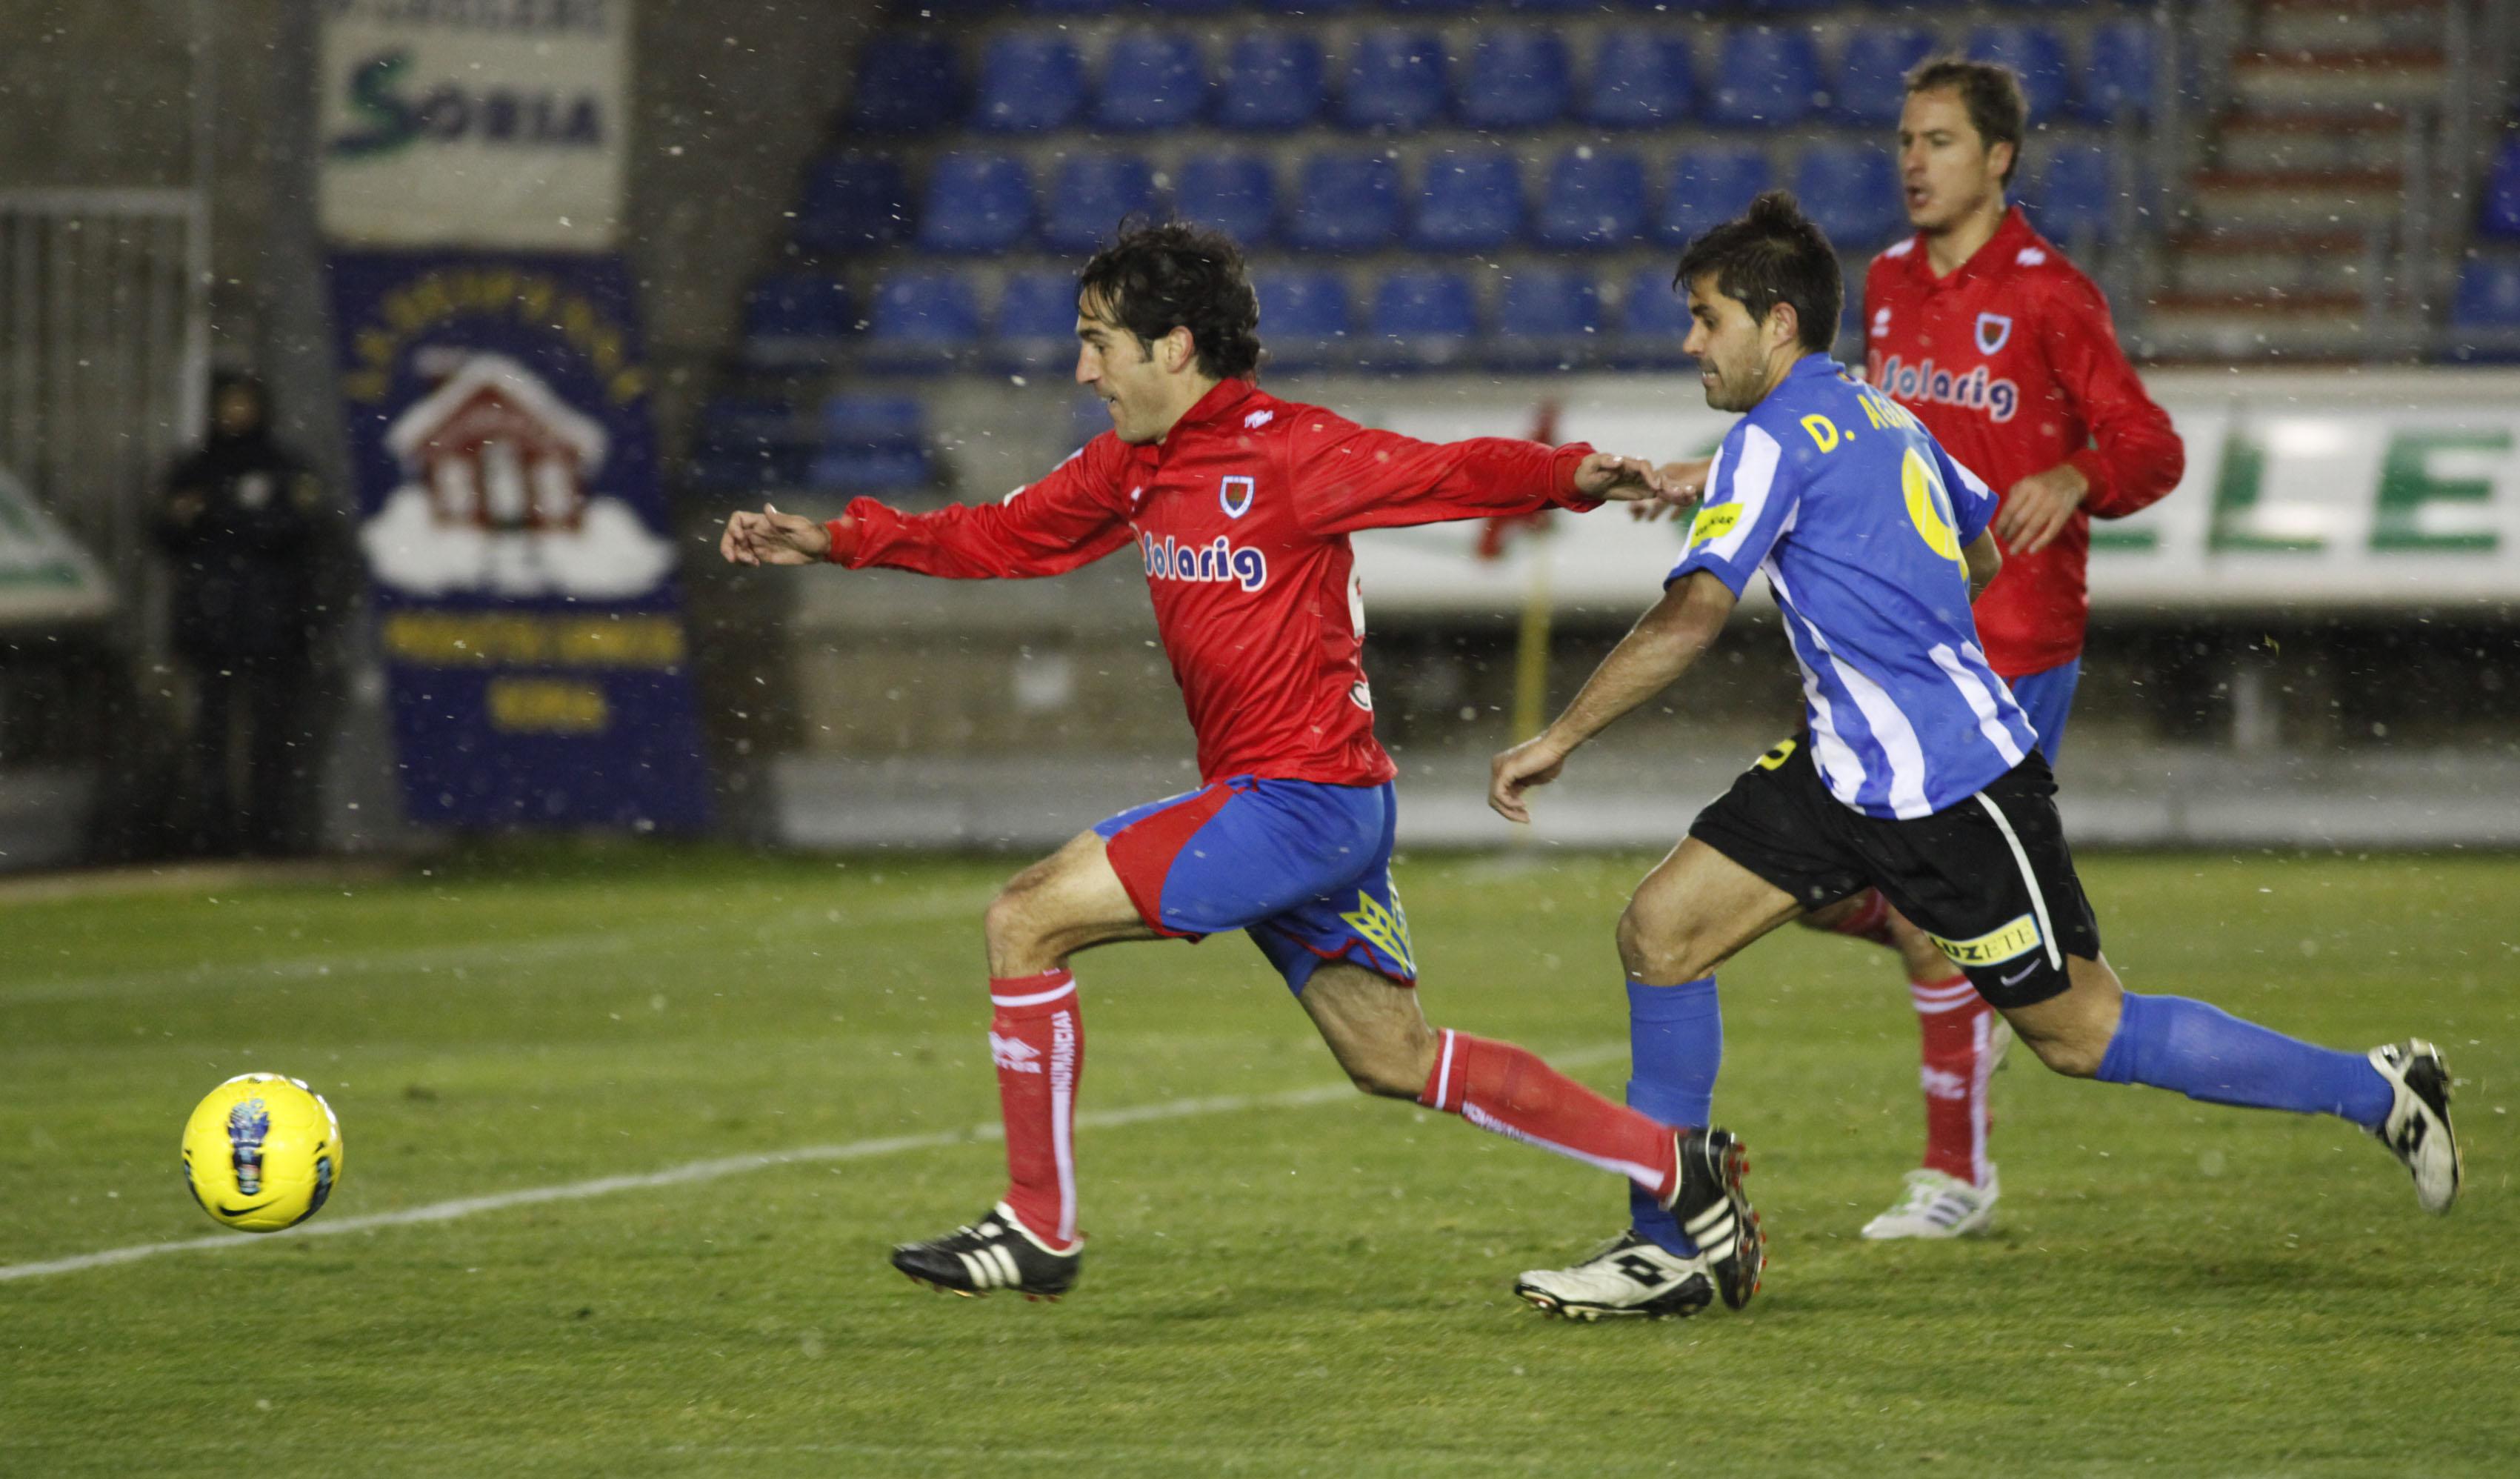 Hércules - Numancia: objetivo playoff